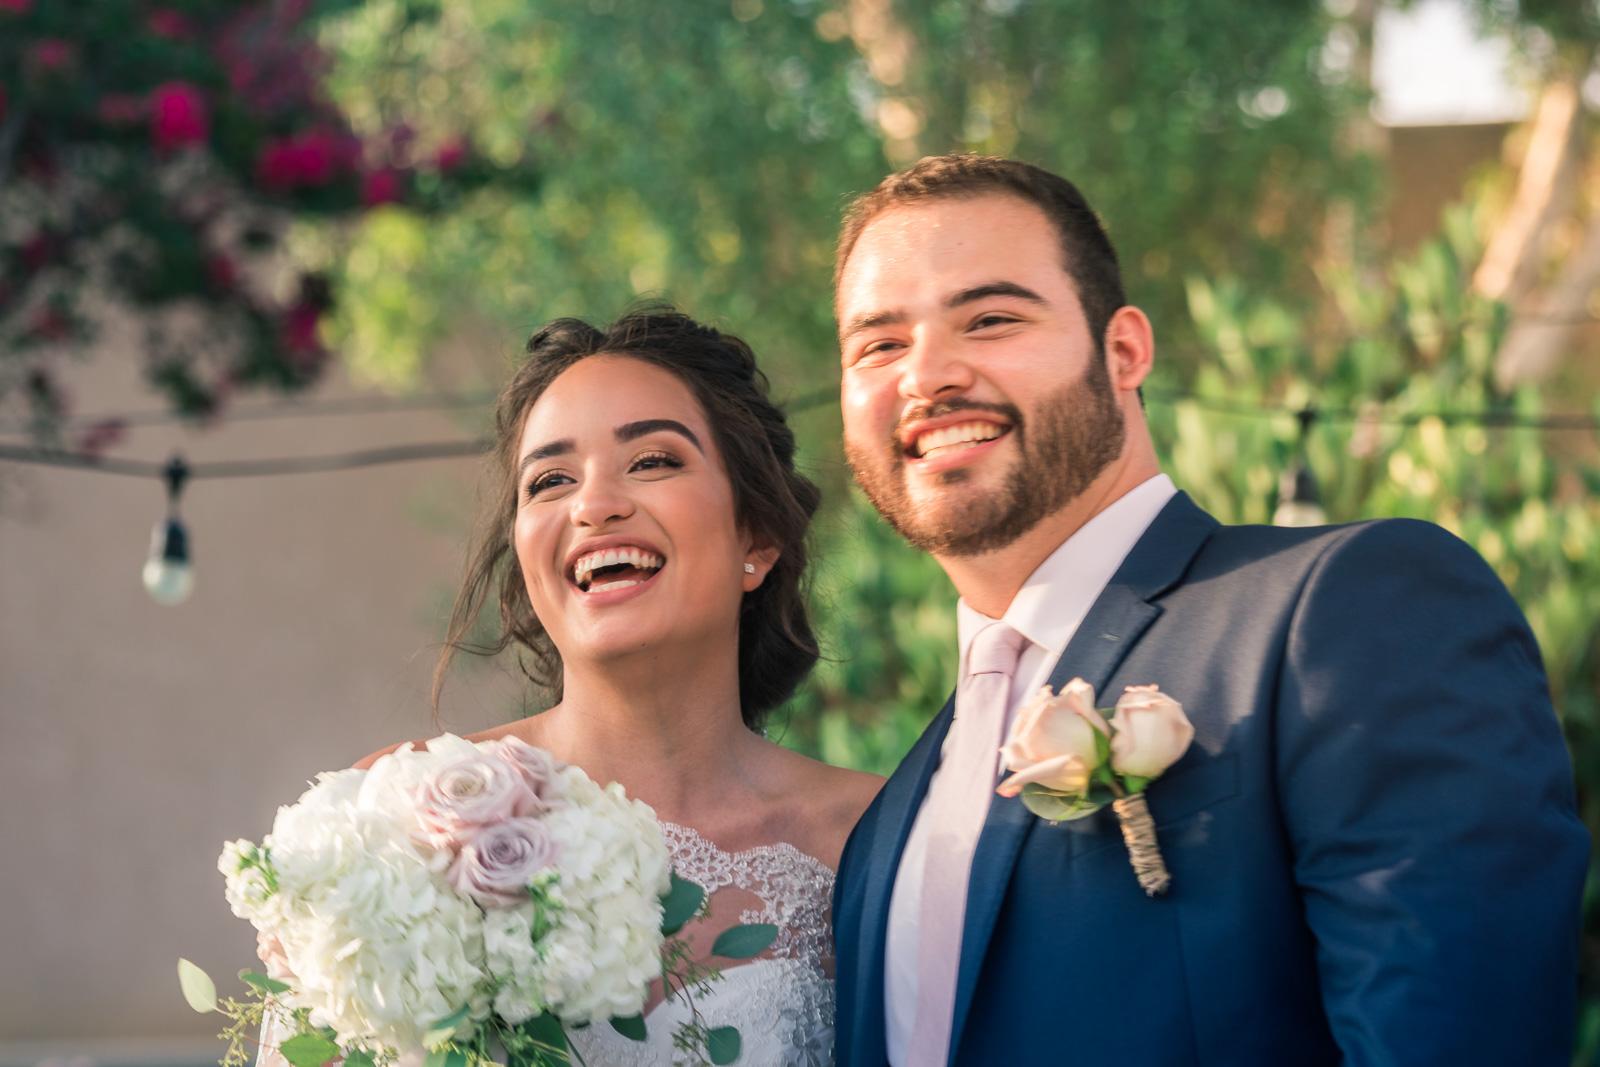 262_Angel-Brea-Orange-County_Joseph-Barber-Wedding-Photography.jpg